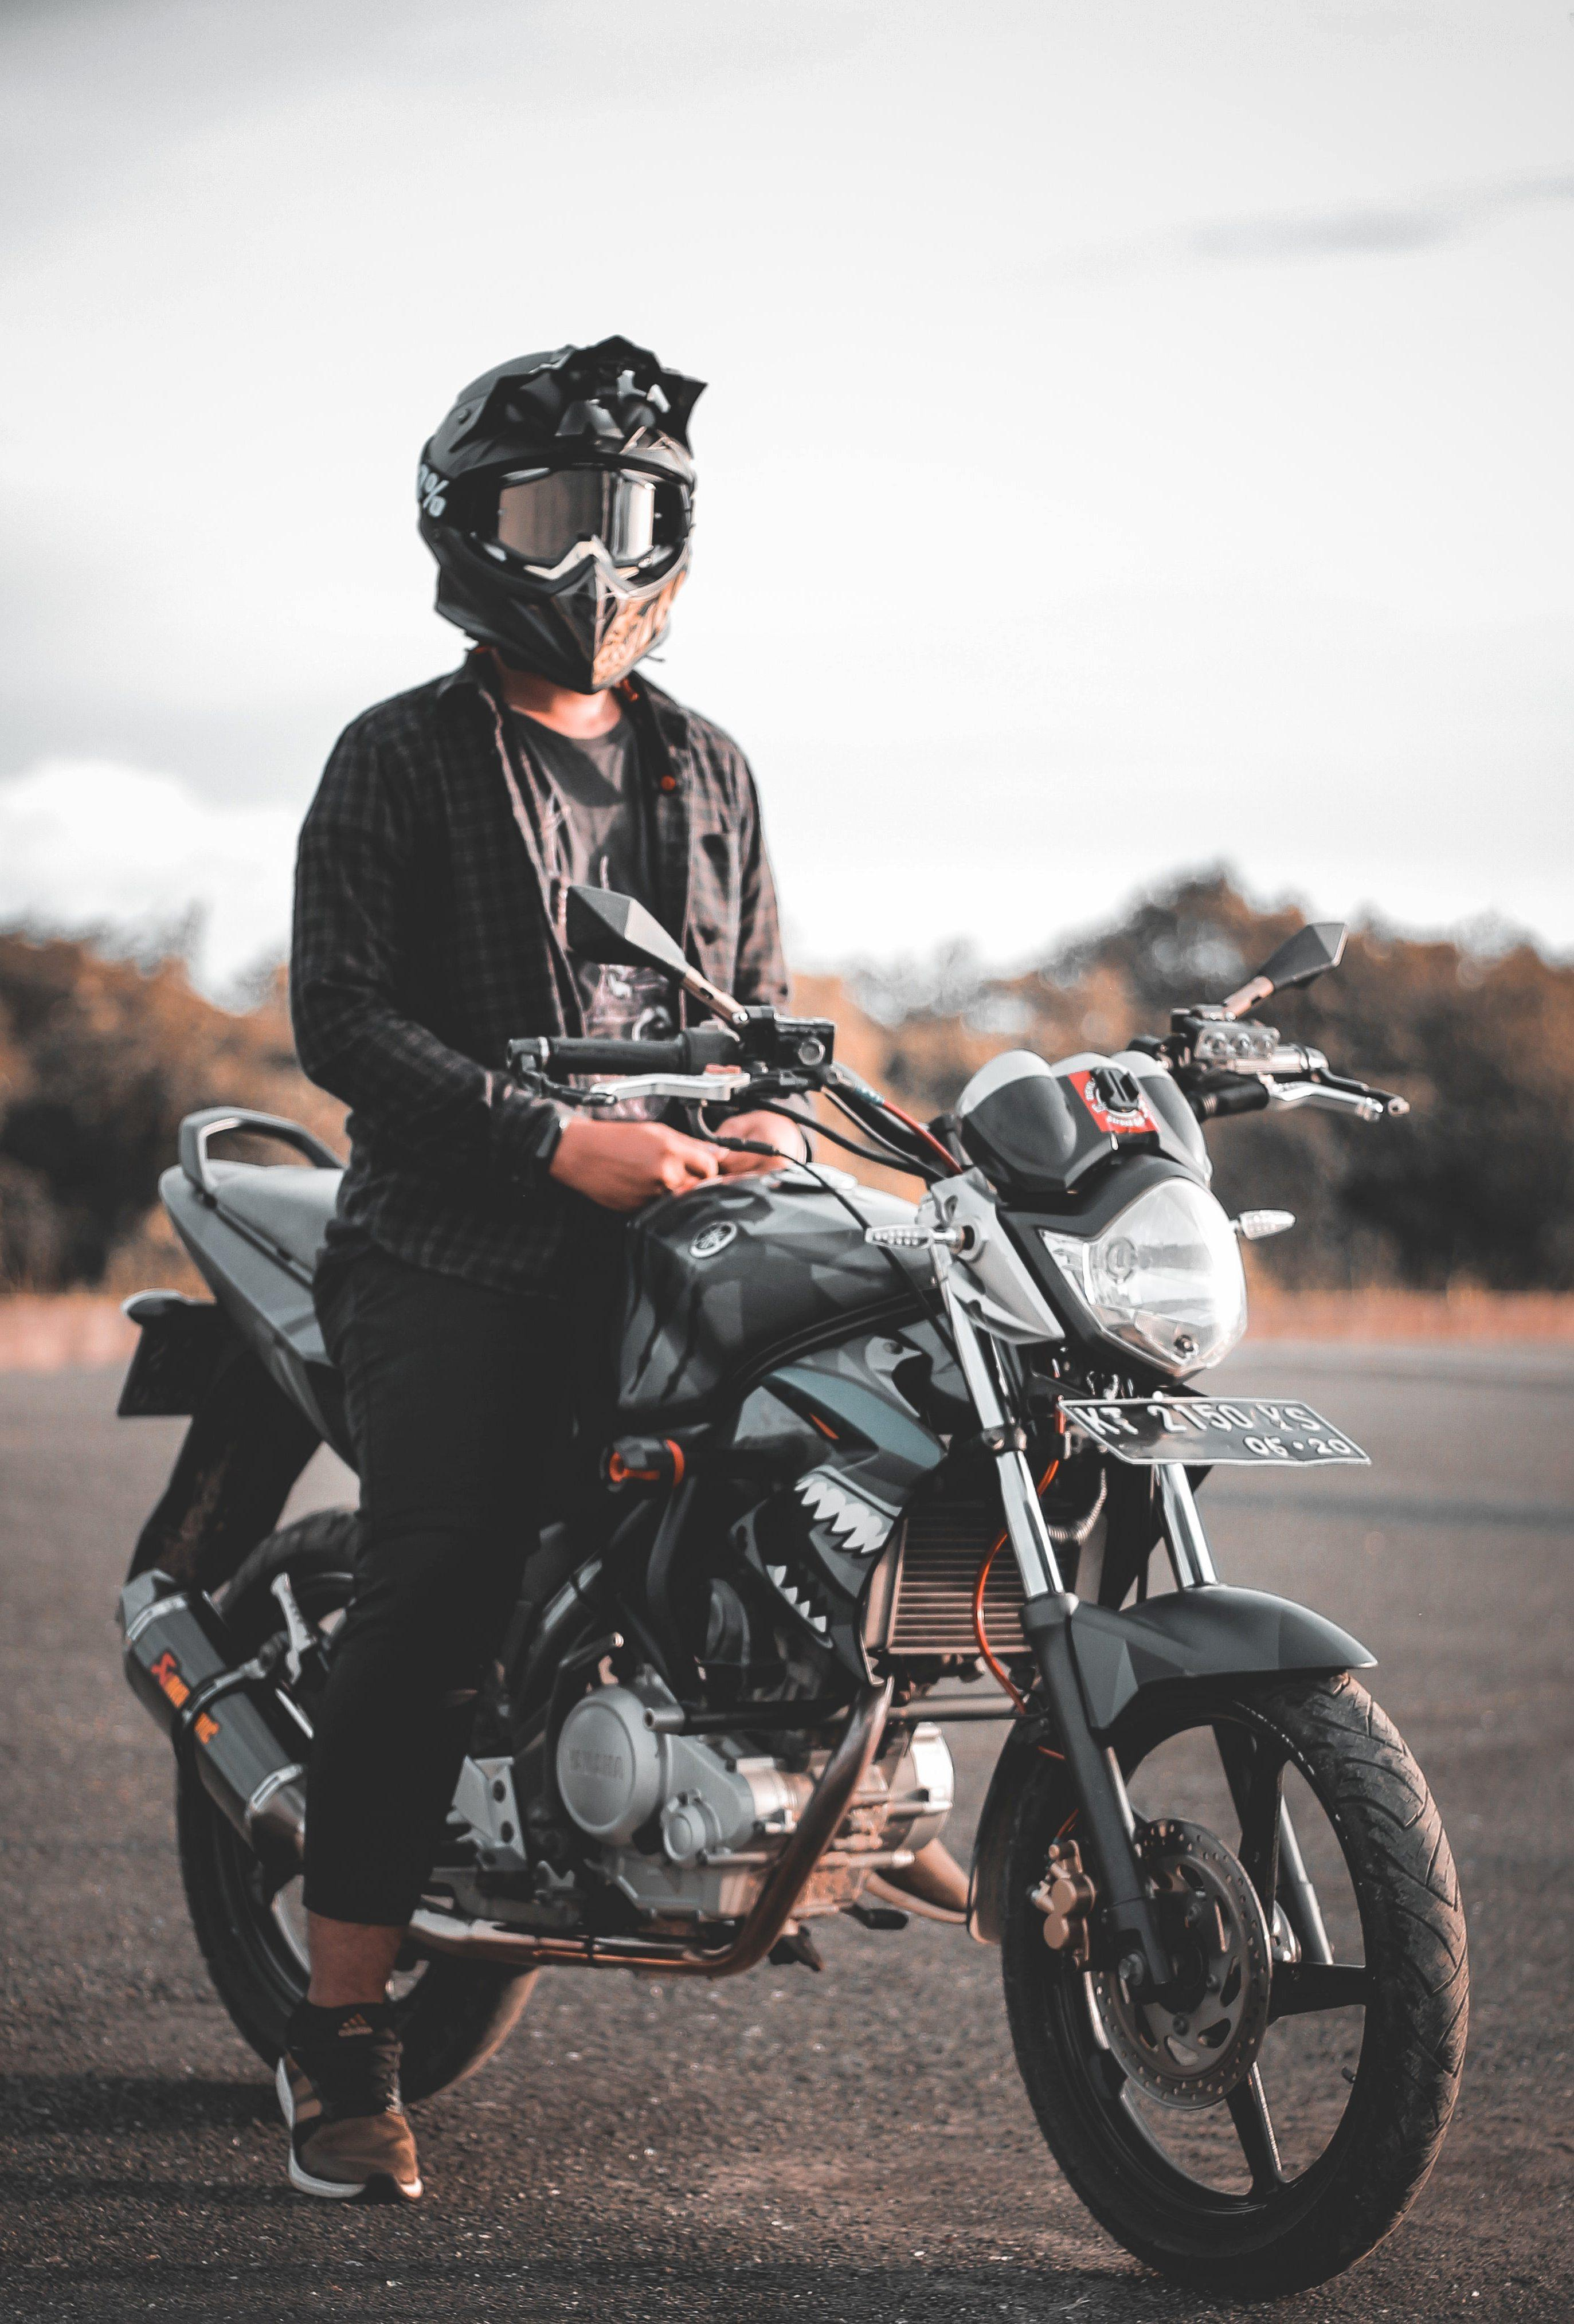 Etiketli resim:Motosiklet ve bisiklet